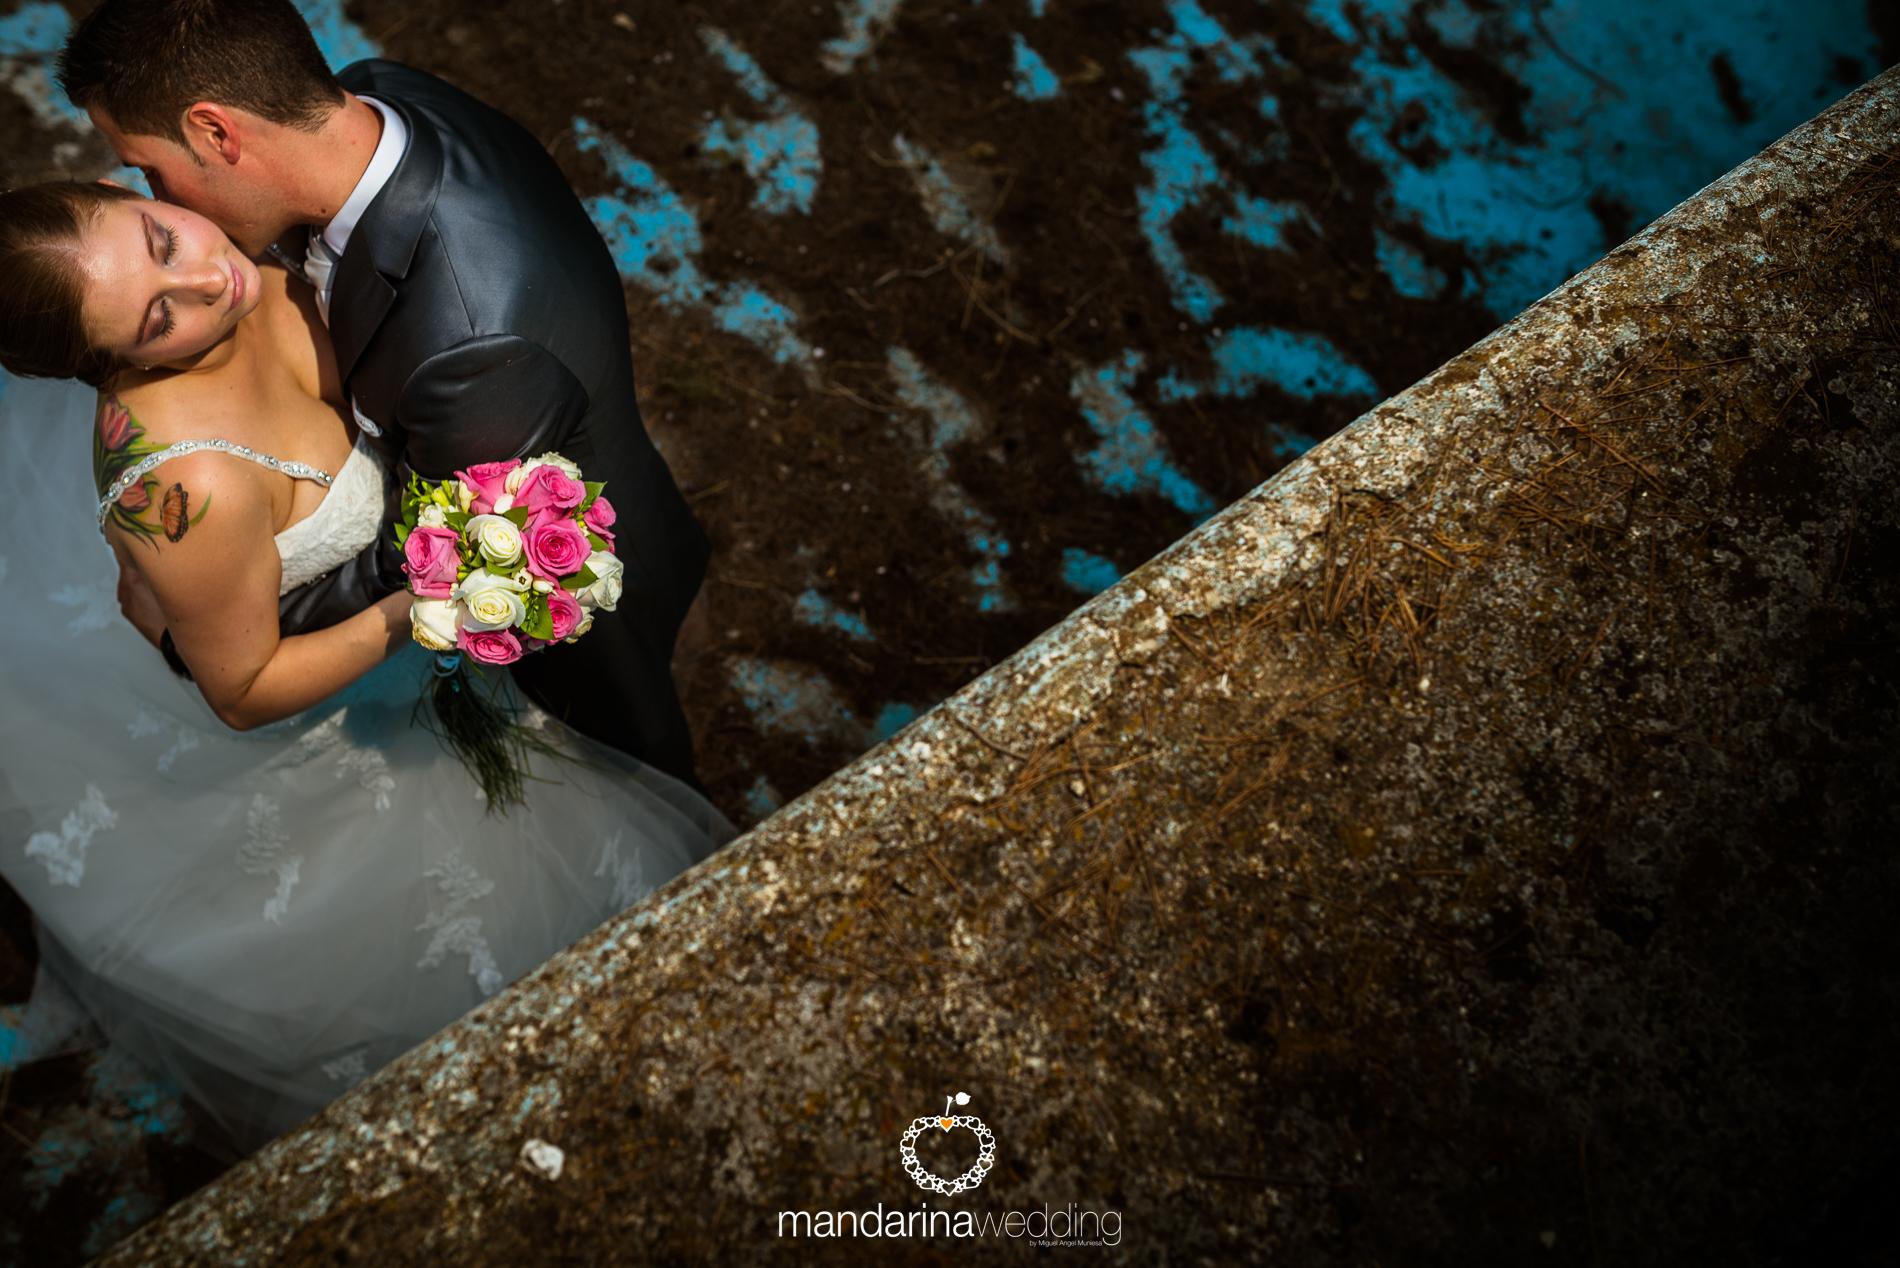 mandarina wedding, mejores fotografos boda, fotografo zaragoza, fotografo huesca, fotografo soria, fotografo lerida_36